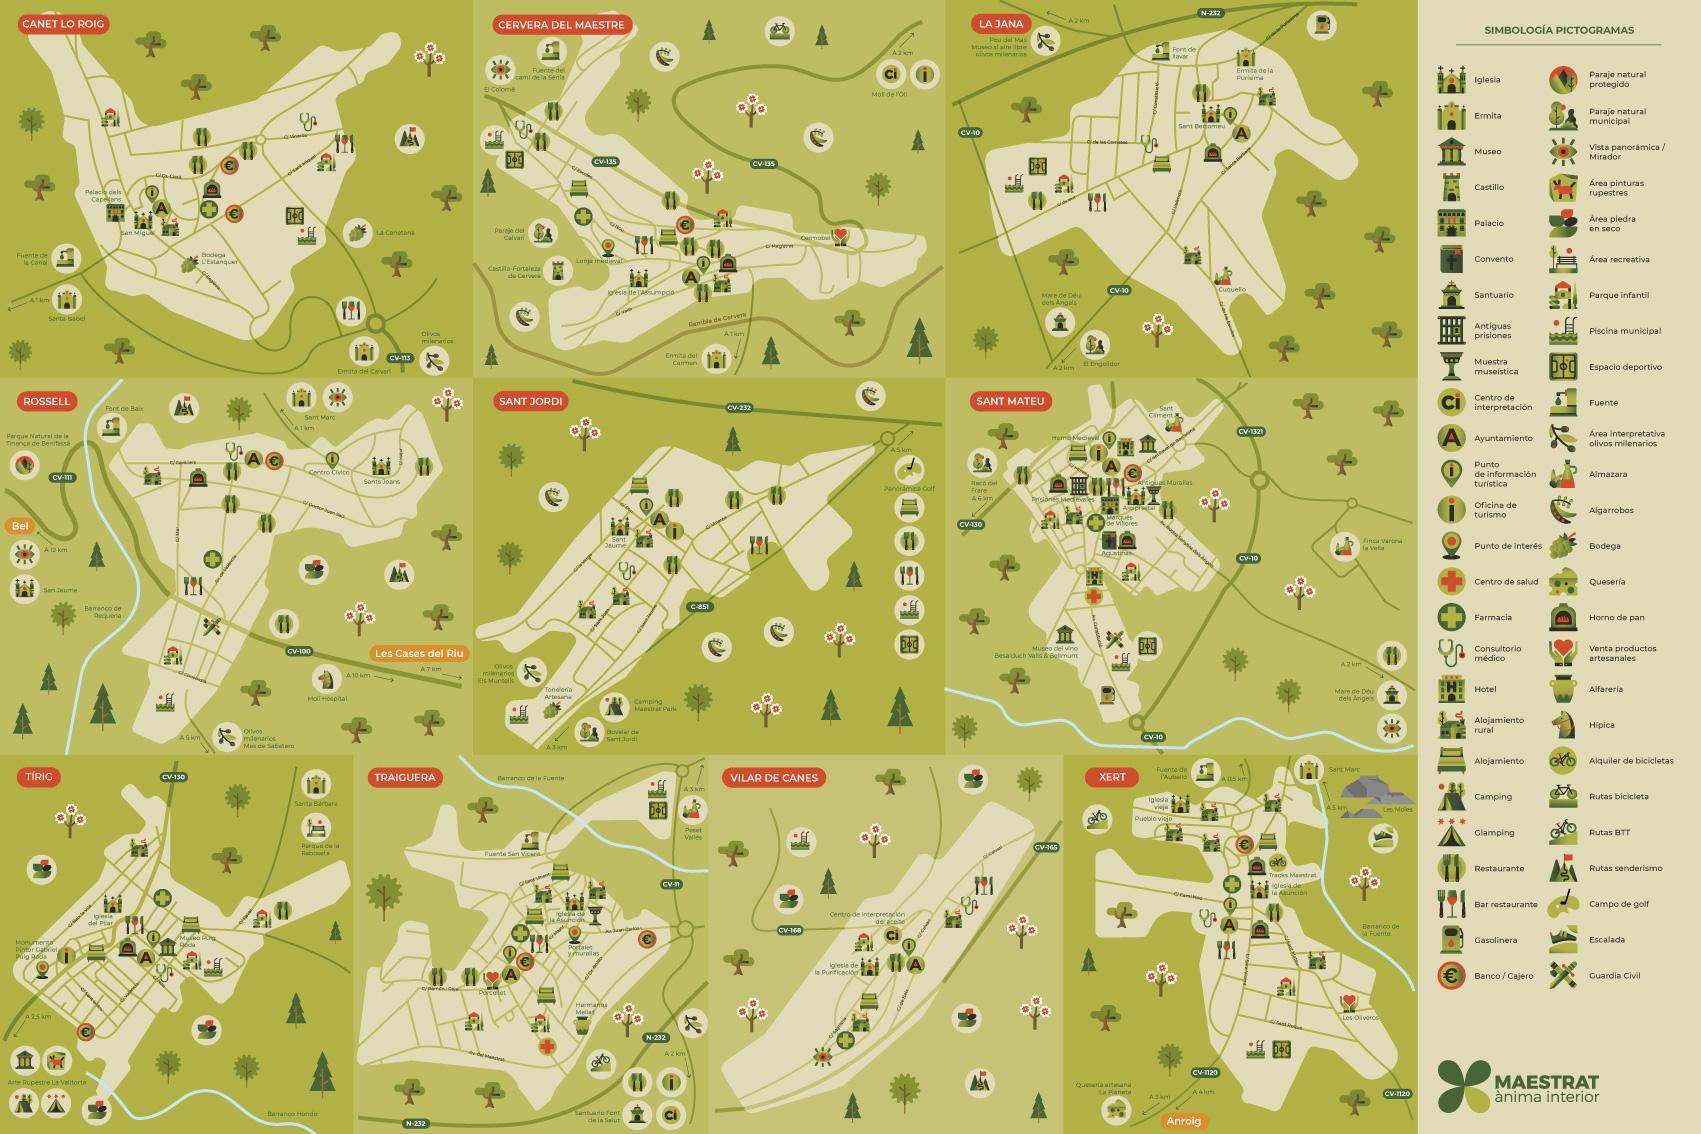 Mapa turístico ilustrado, pictogramas